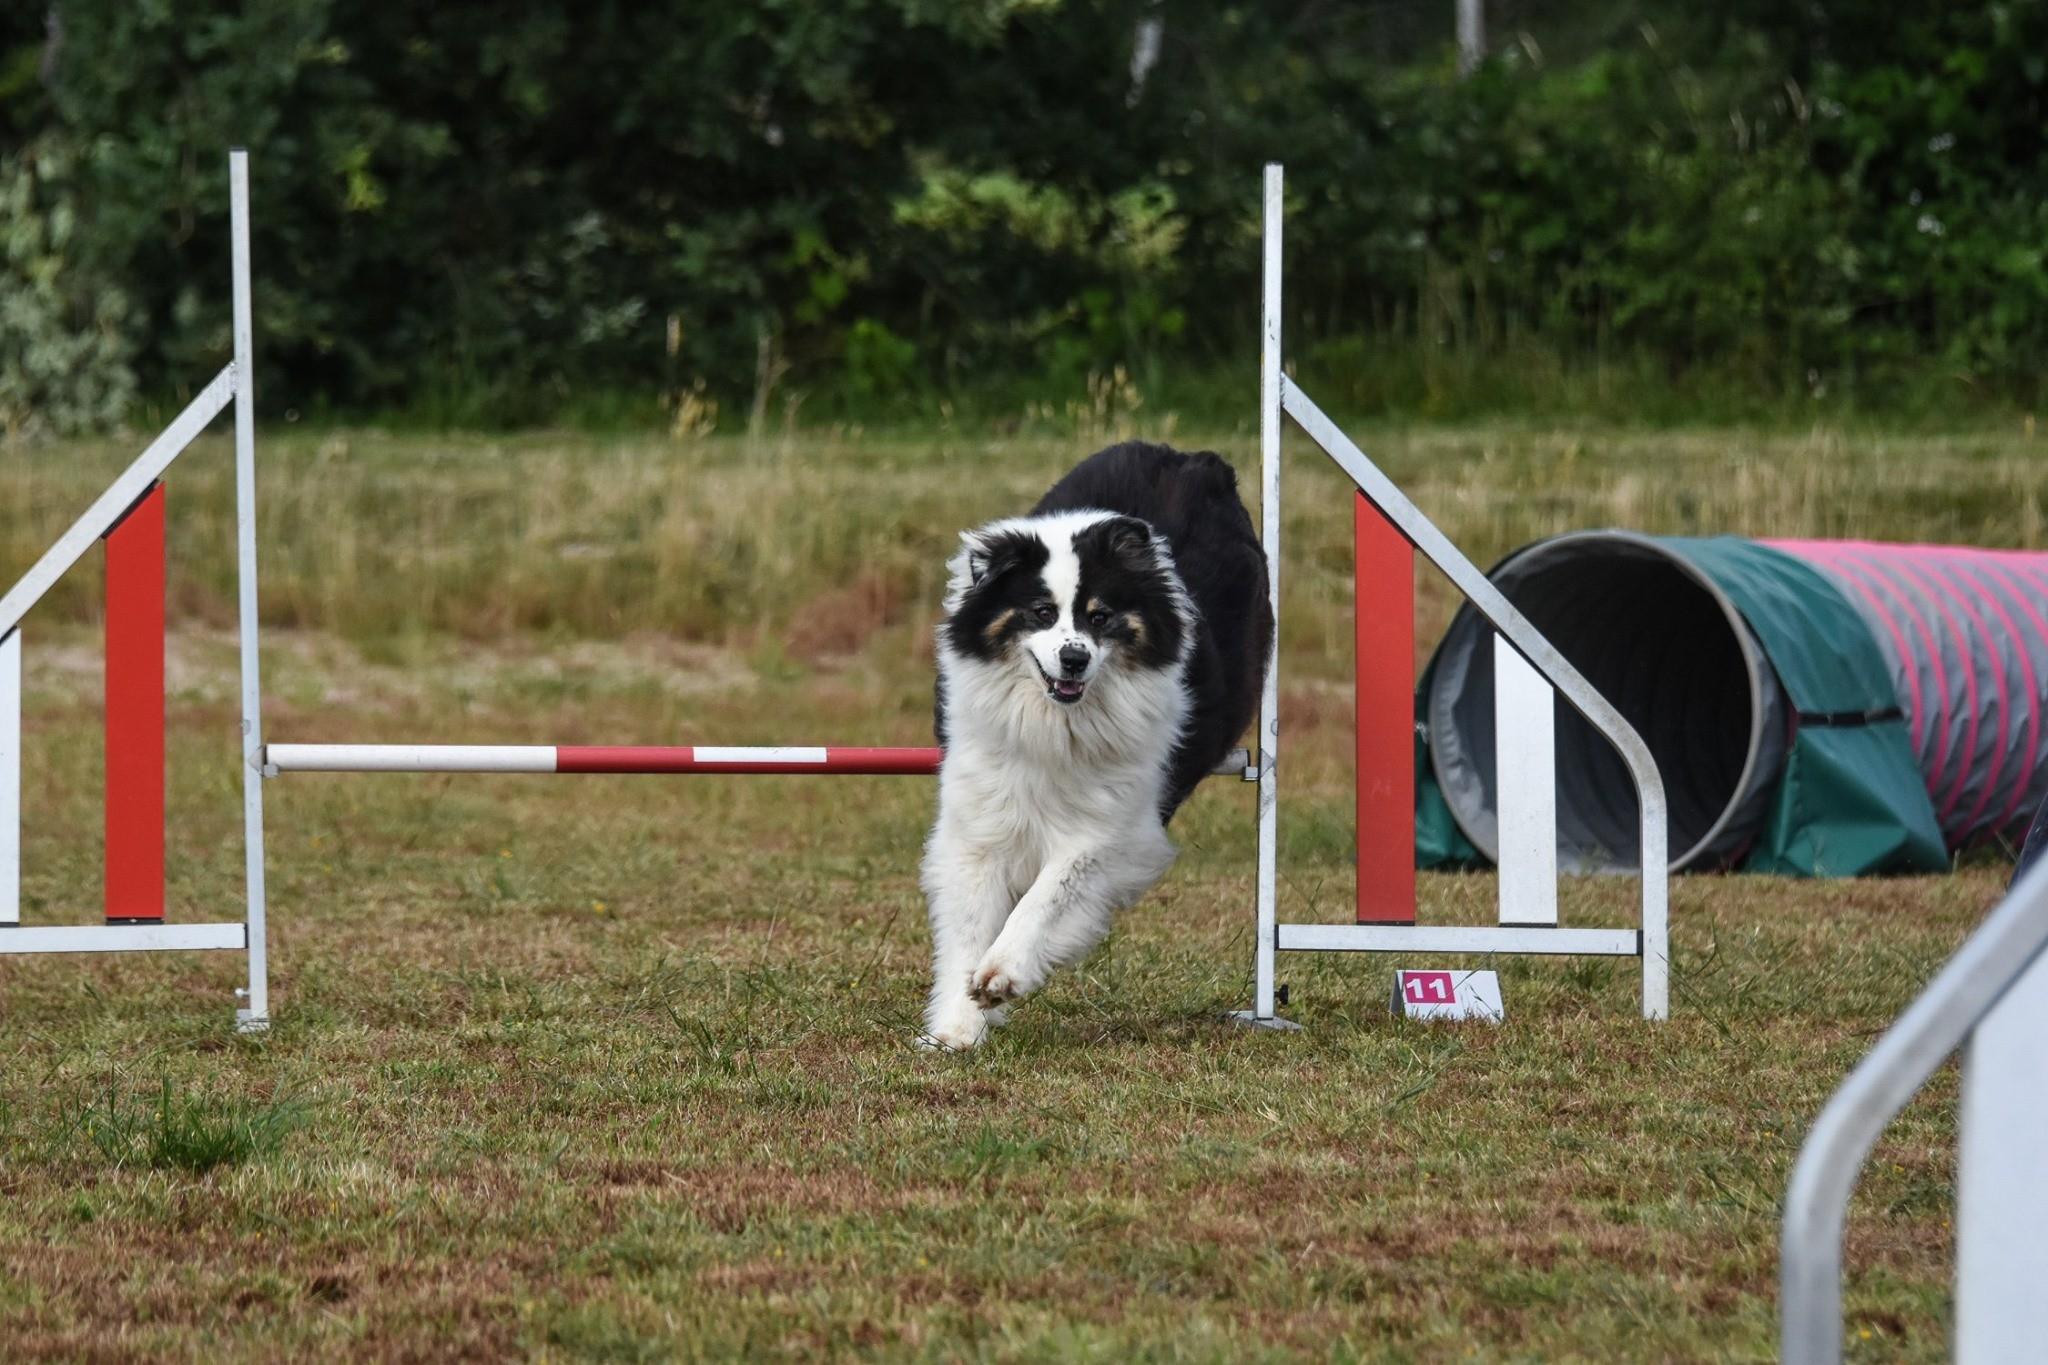 14/06/2020 Sortie Natural Dog Sport